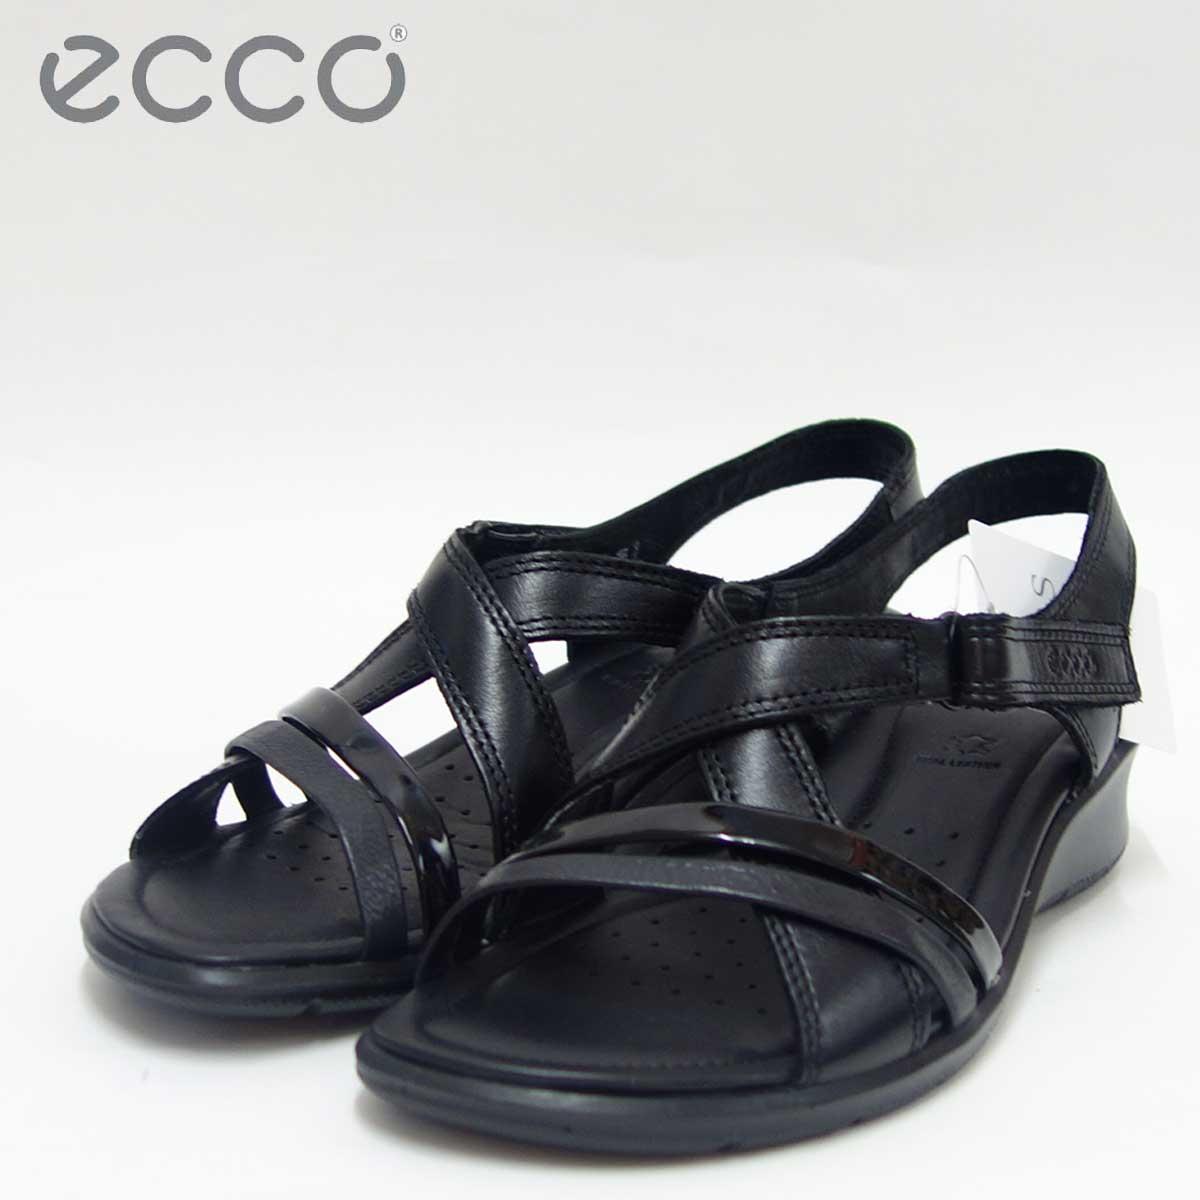 ECCO エコー 216513 ブラック快適な履き心地のバックストラップサンダル天然皮革コンフォートサンダル(レディース)「靴」